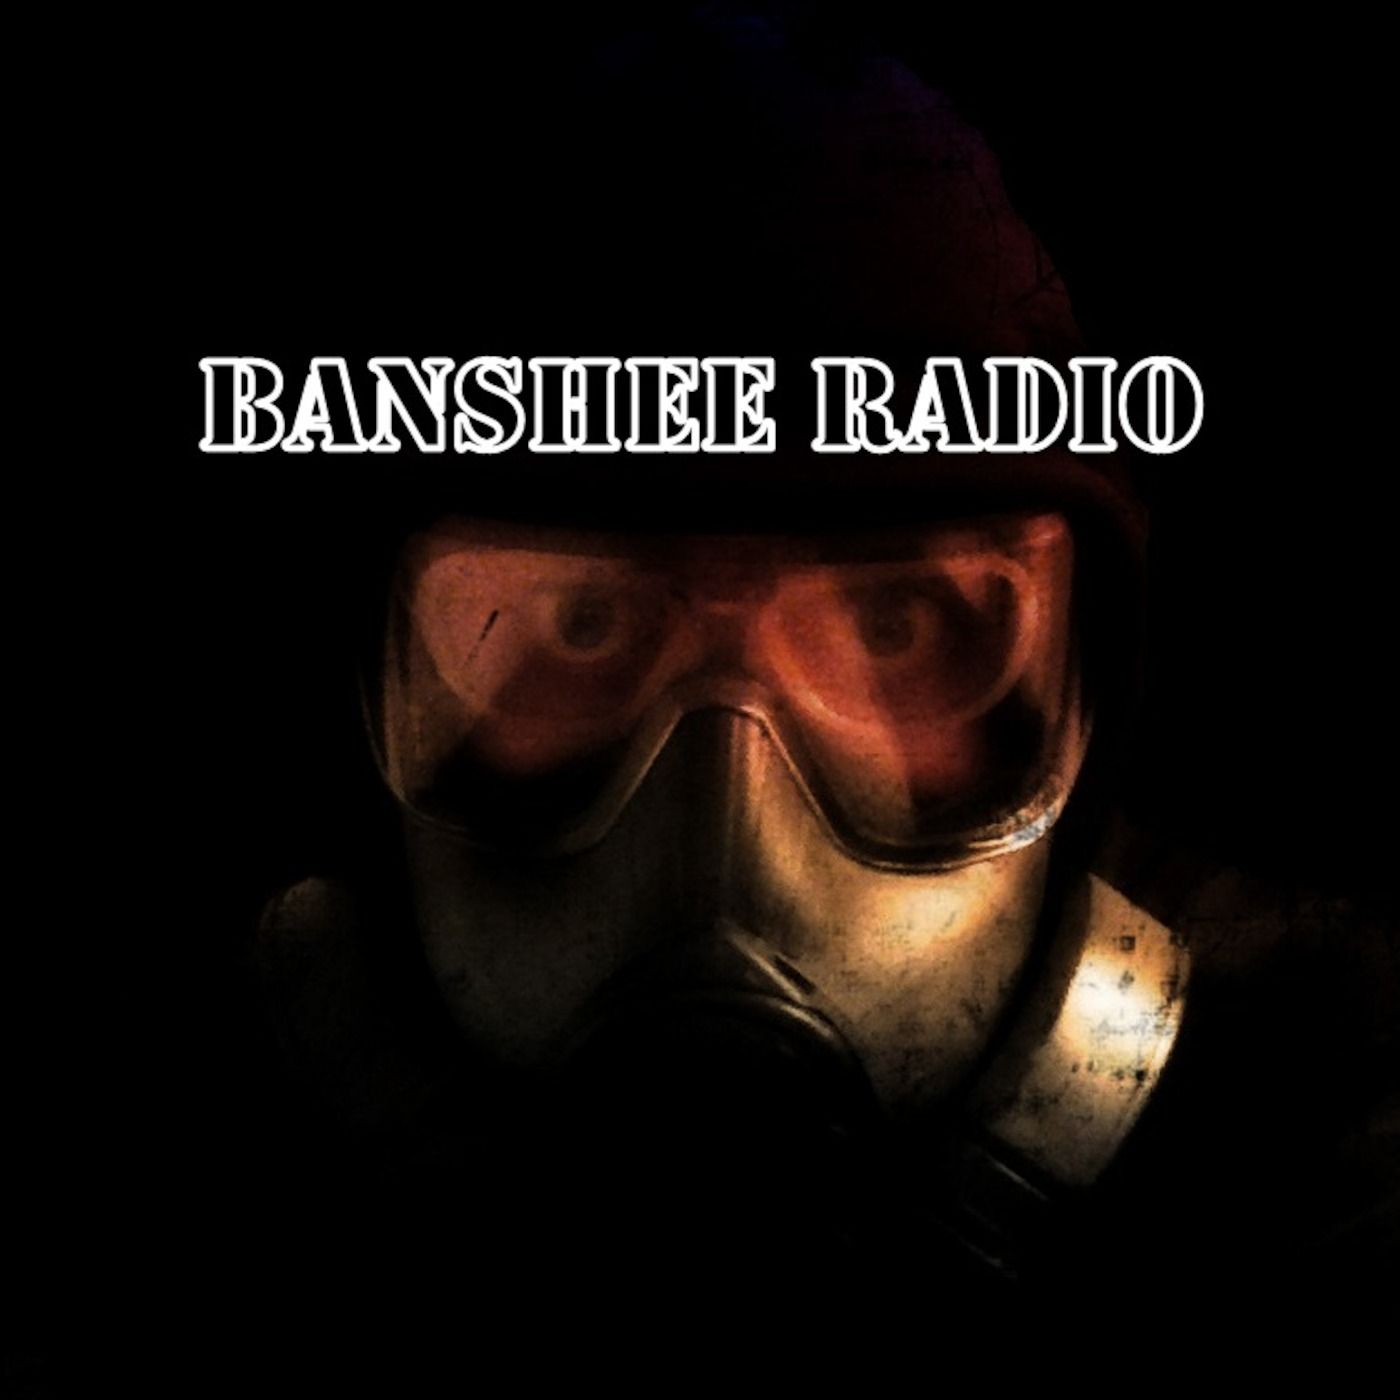 Banshee Radio